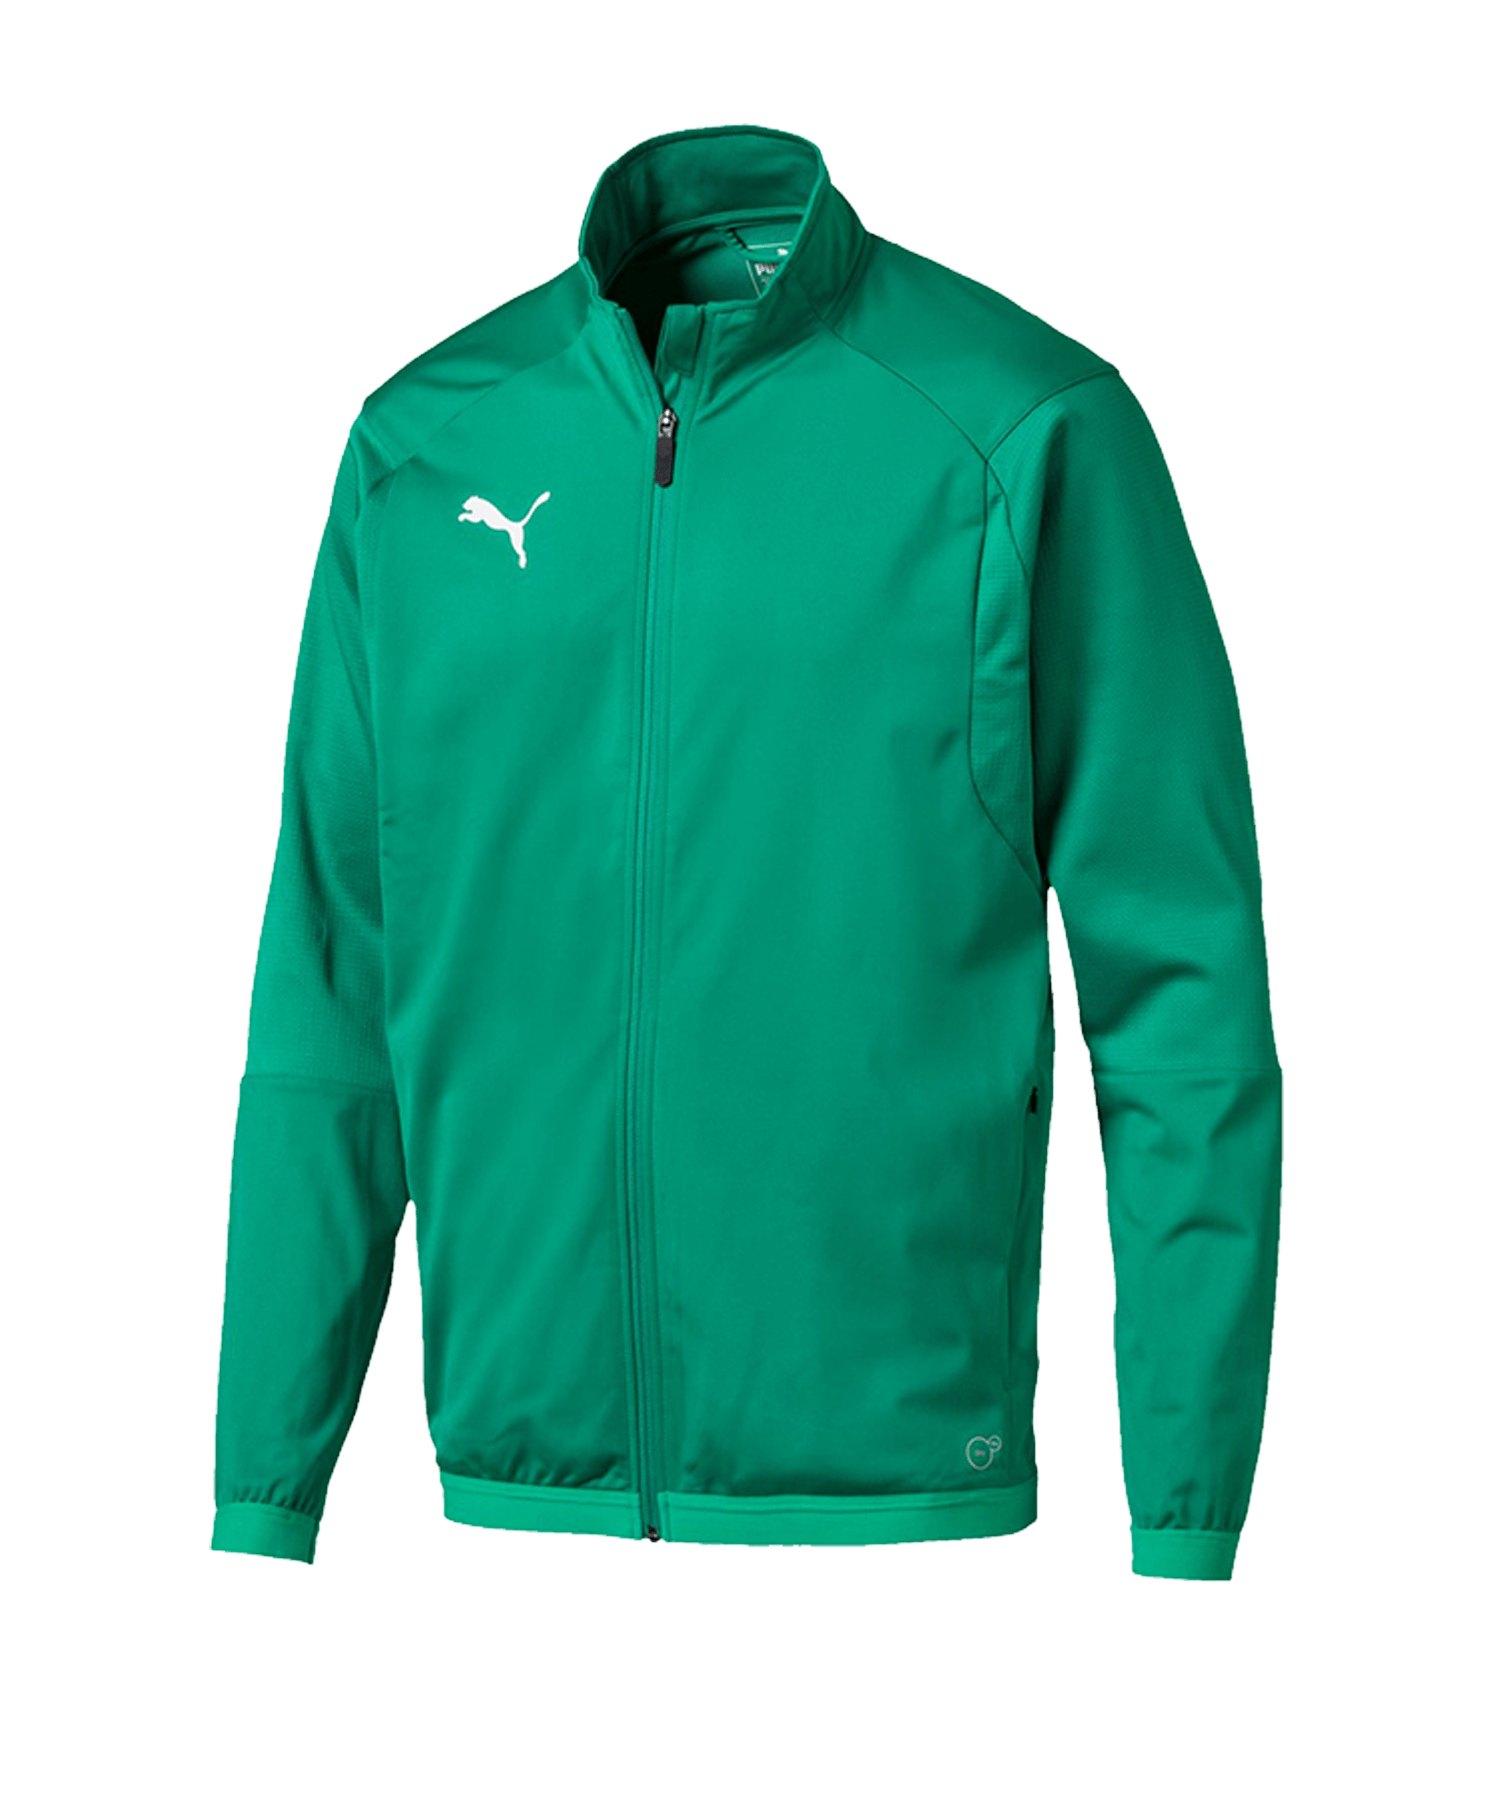 PUMA LIGA Trainingsjacke Grün F05 - gruen